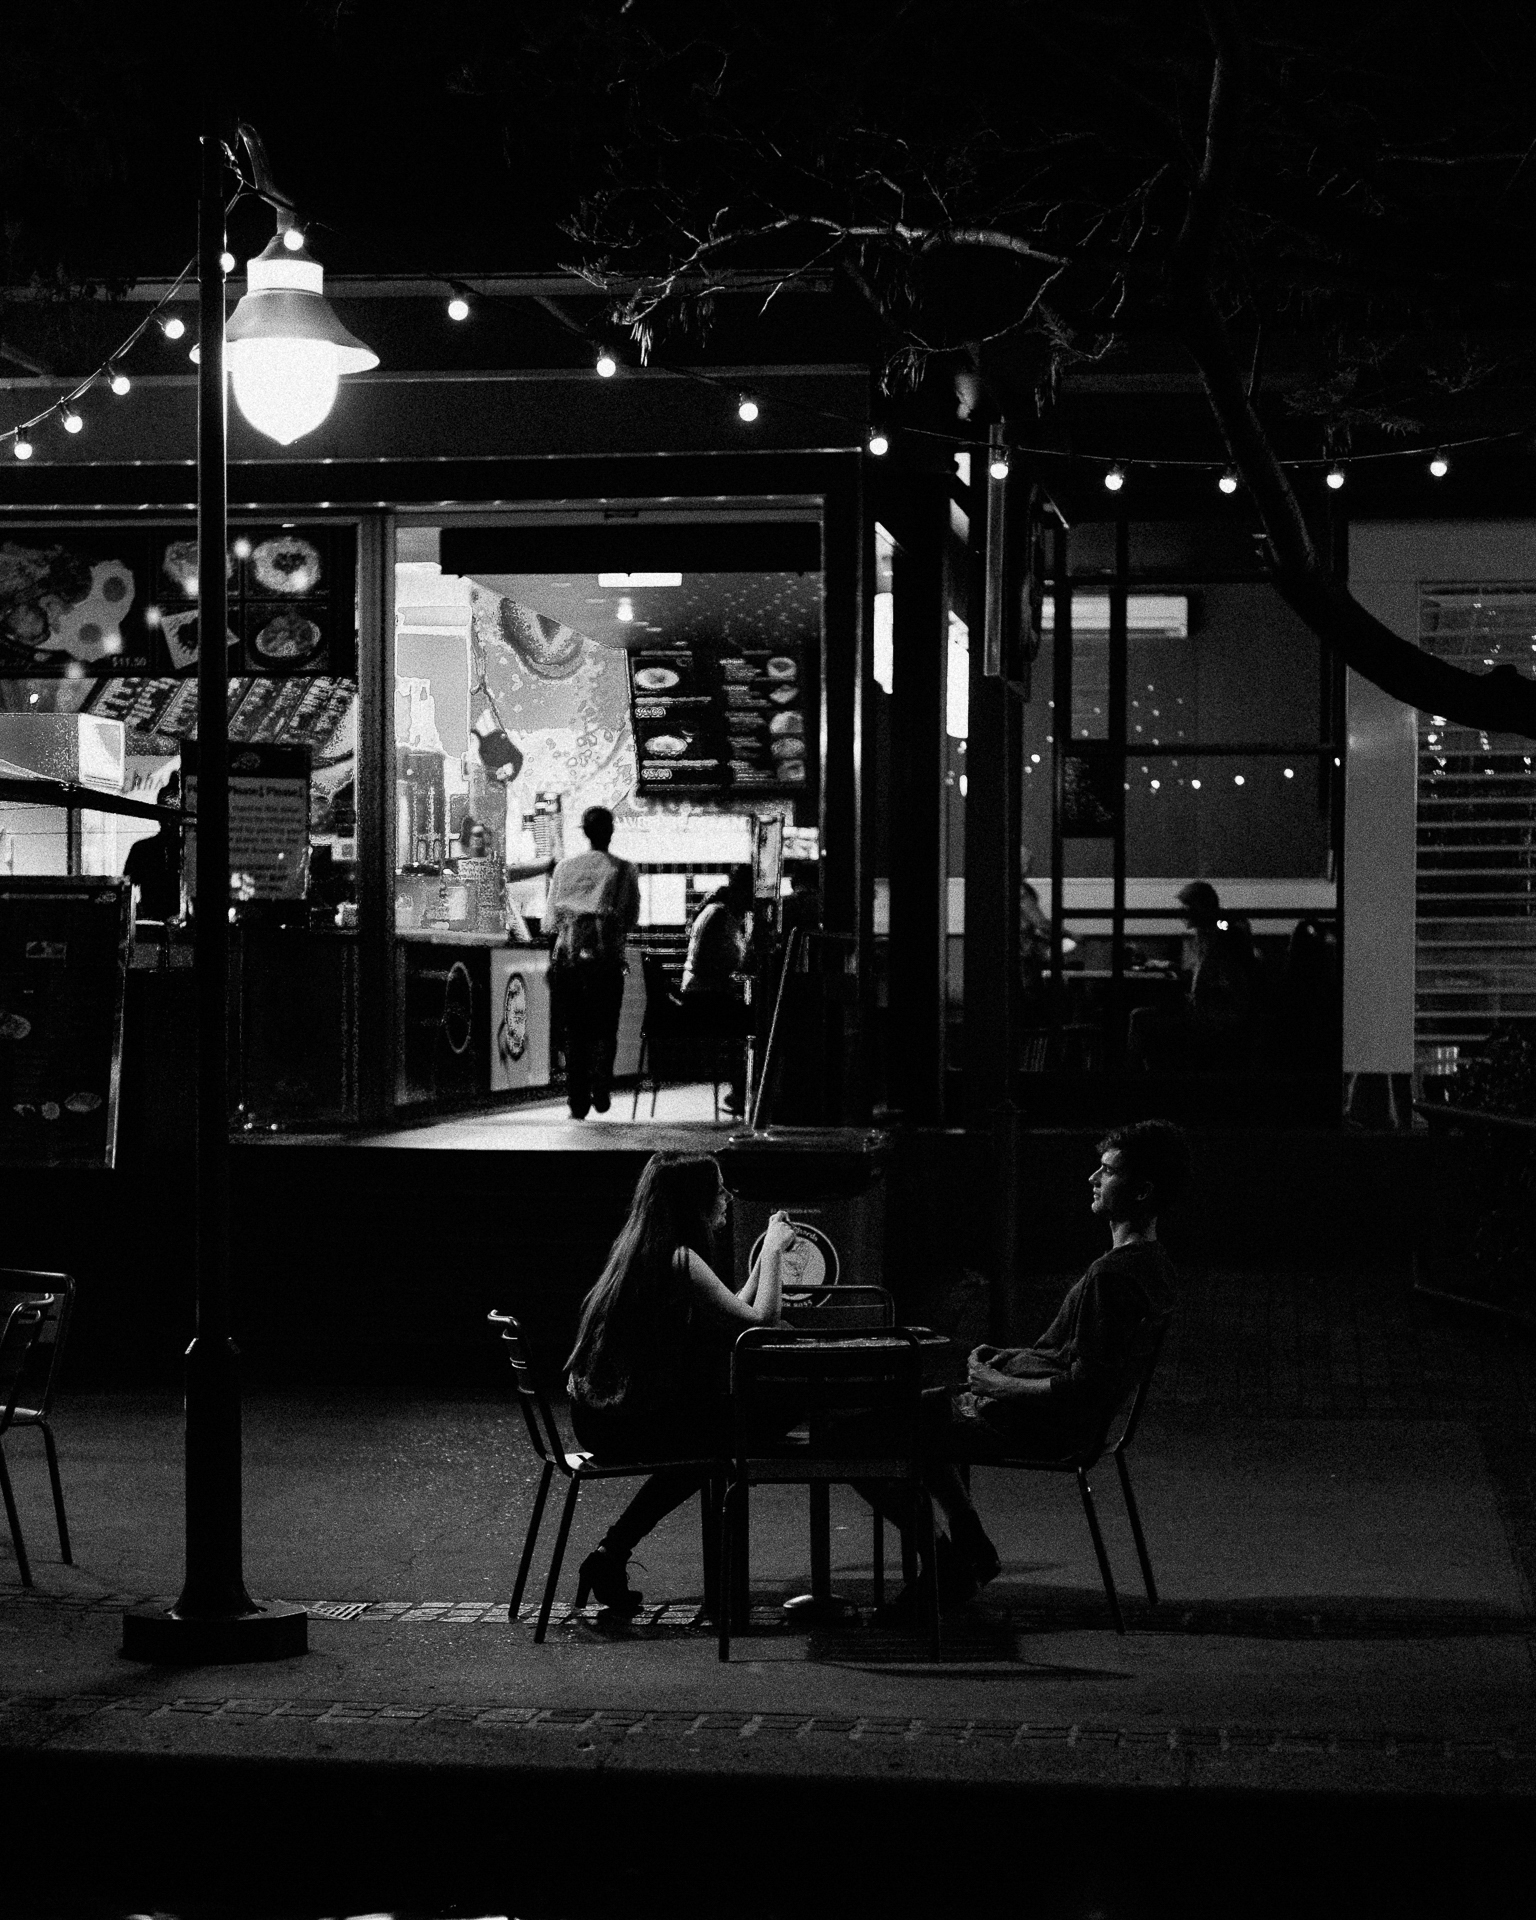 Dinner by Streetlight